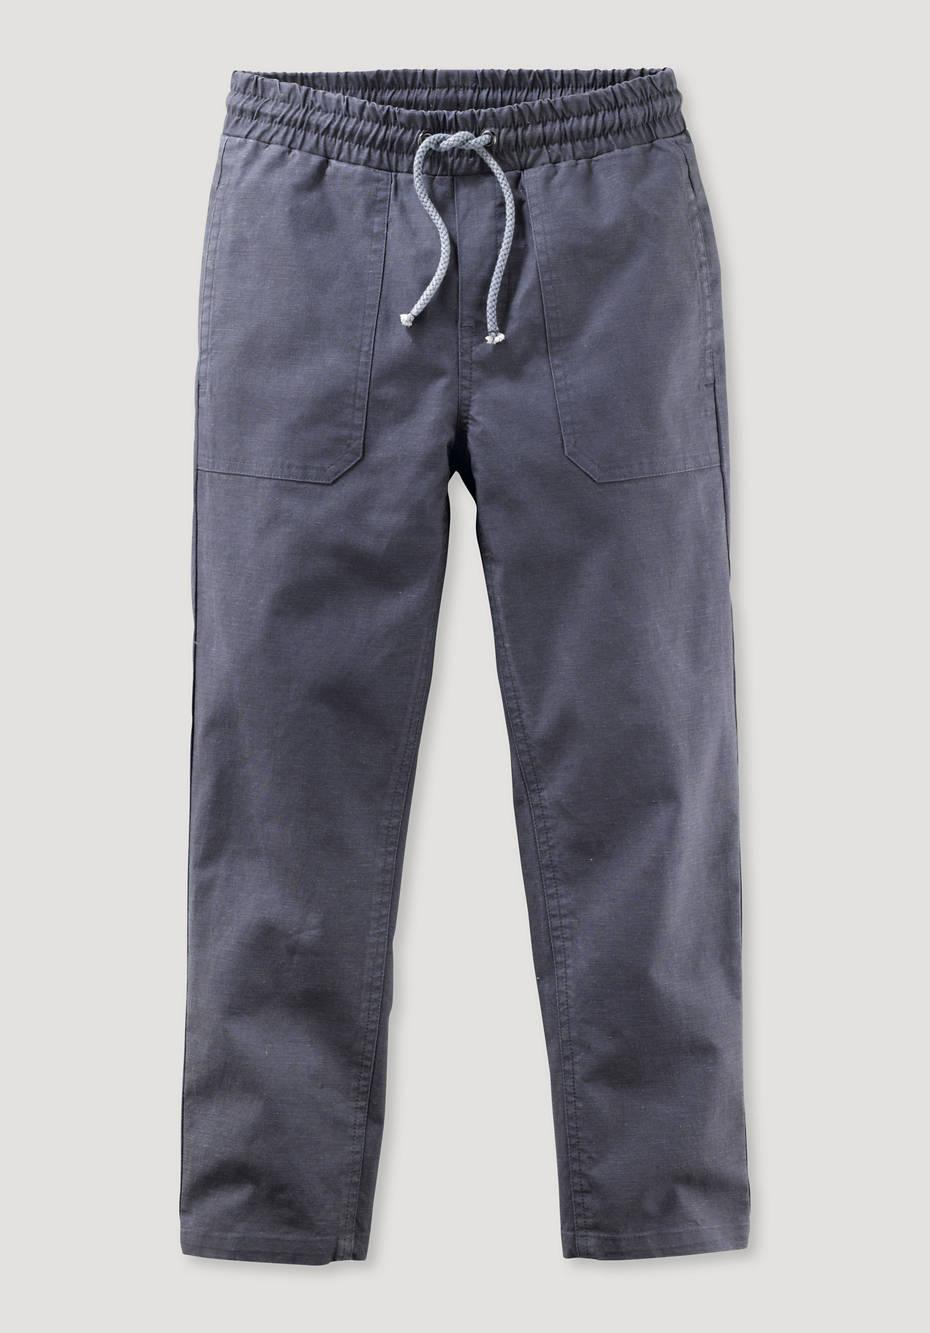 Pants made of organic cotton with hemp